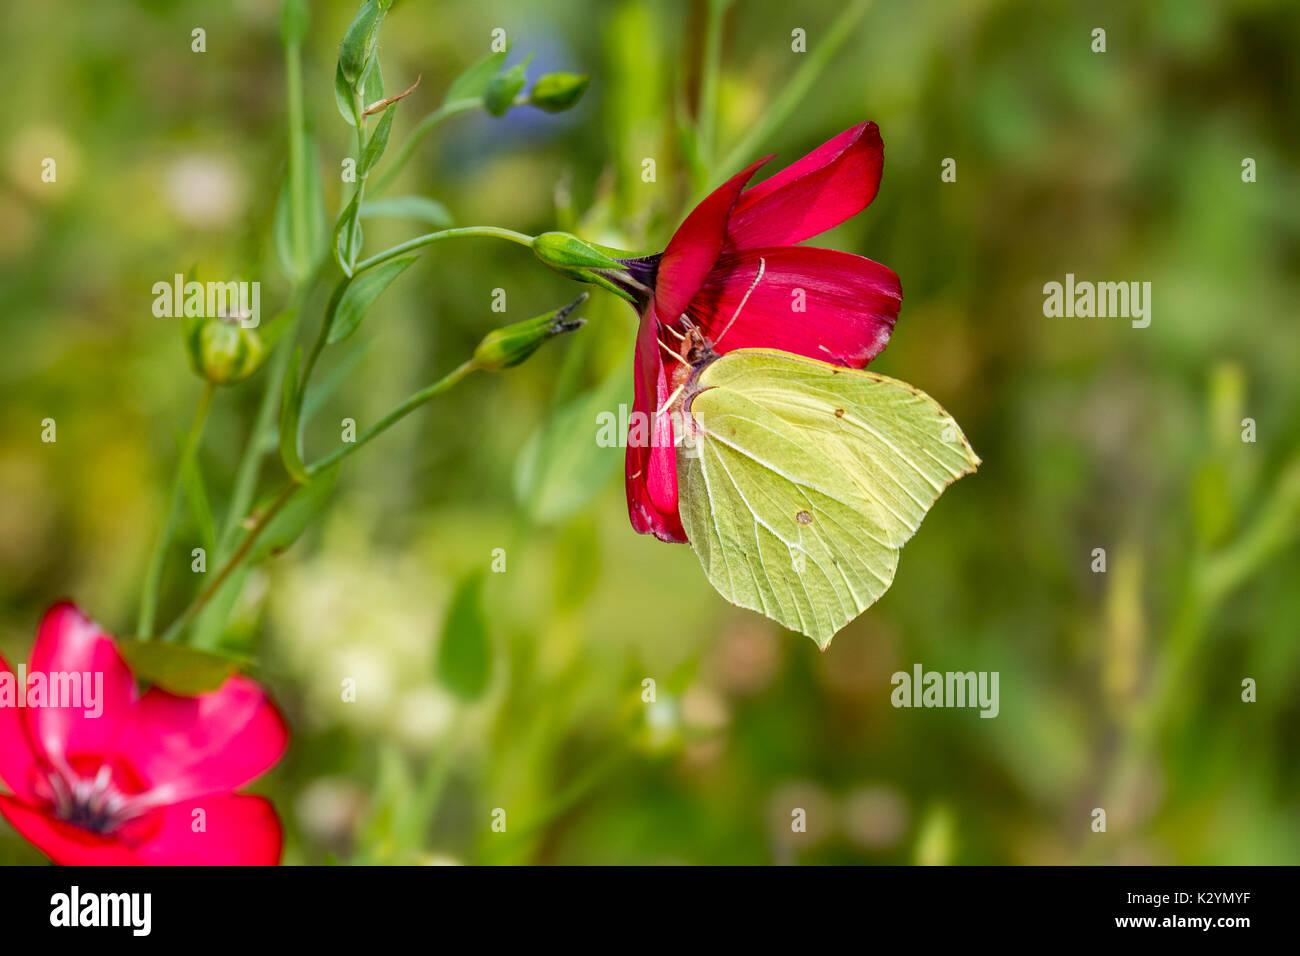 Common brimstone (Gonepteryx rhamni) feeding on nectar from flower in meadow - Stock Image